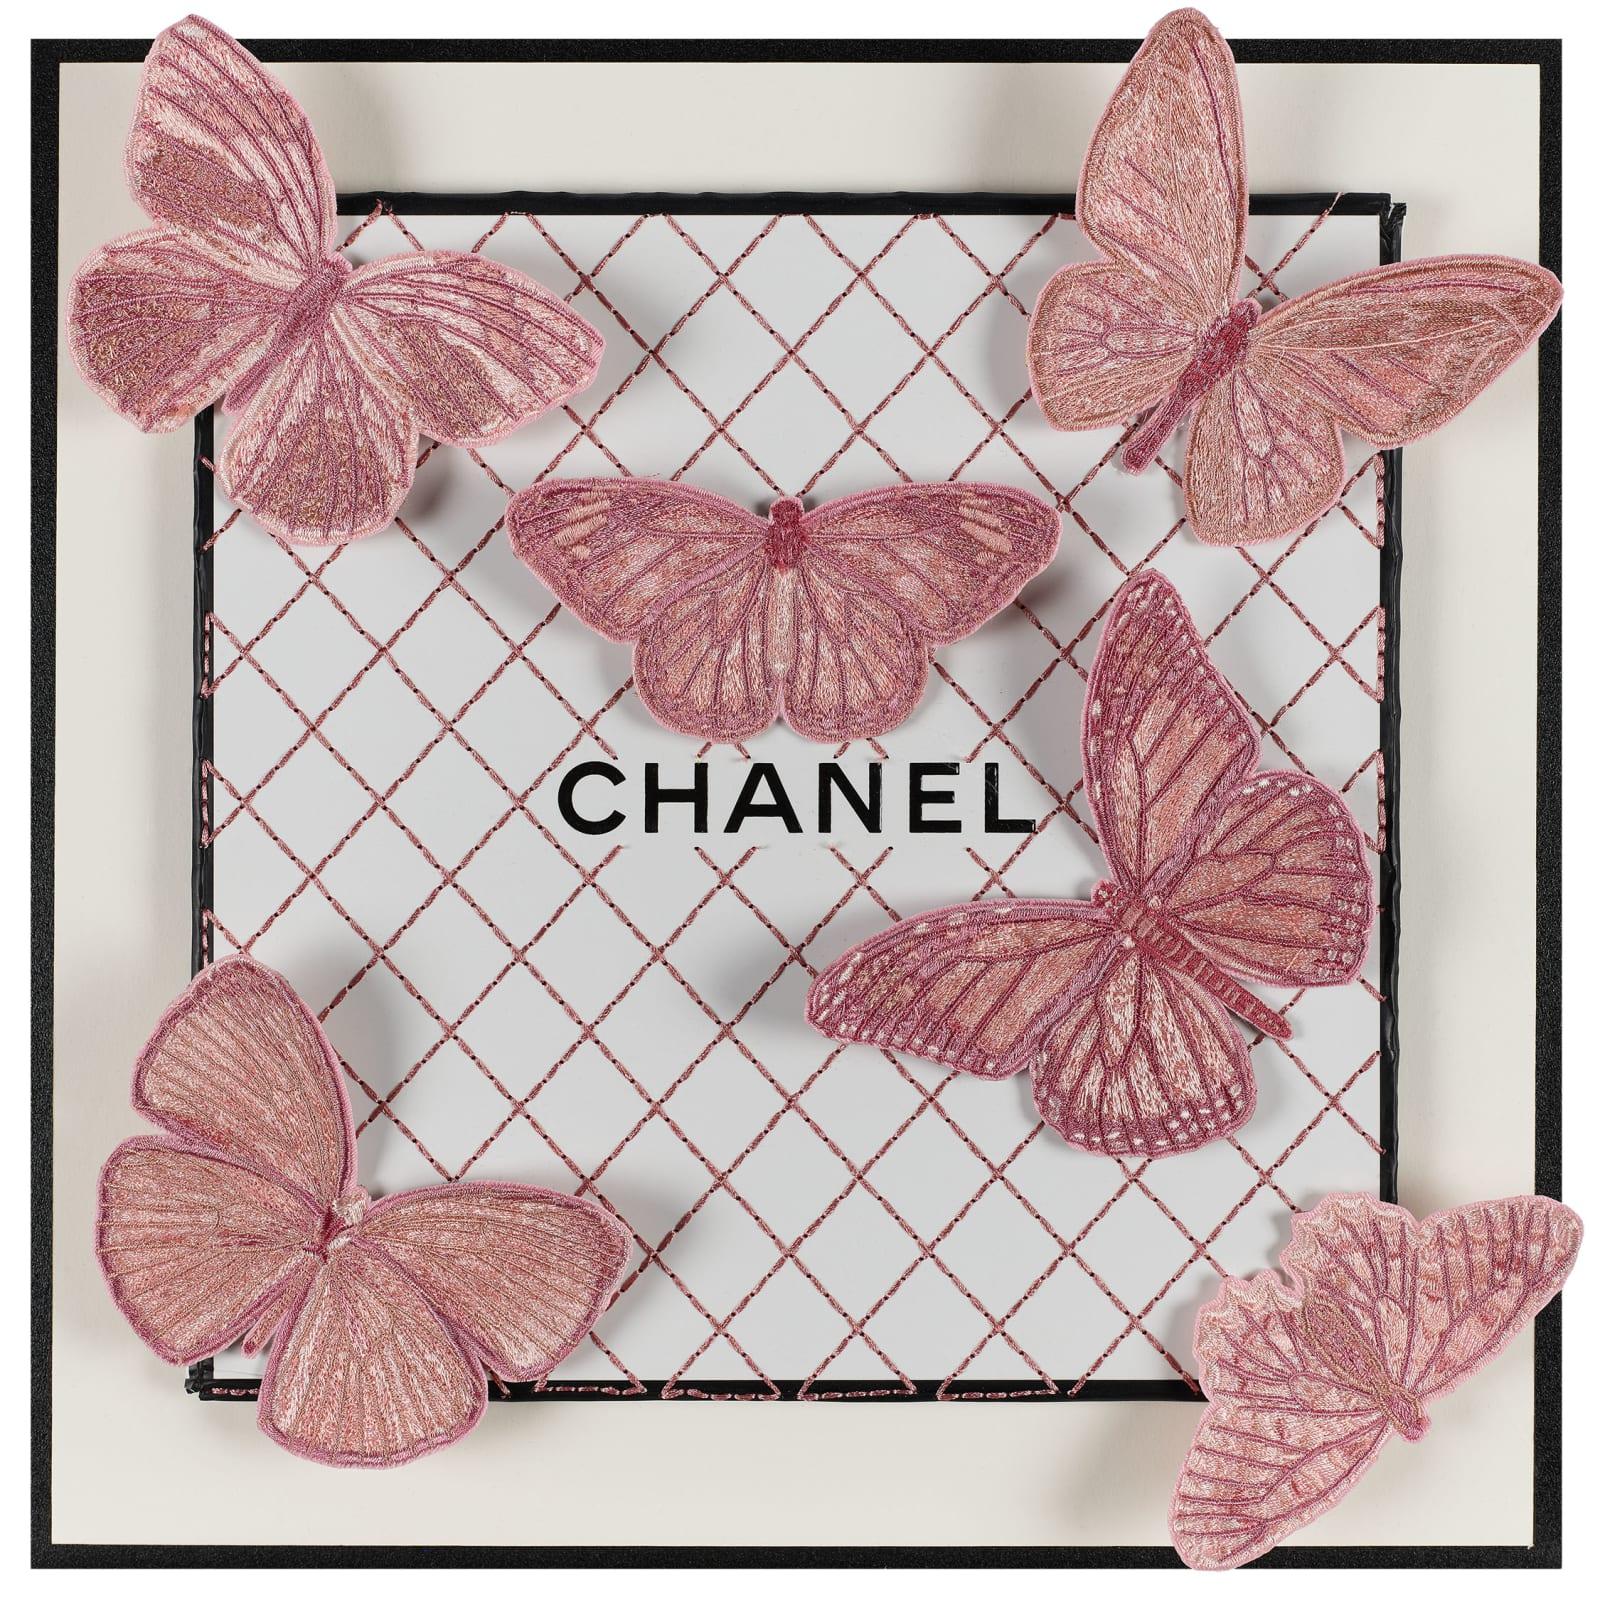 Stephen Wilson, Pastel Pink Chanel III, 2019